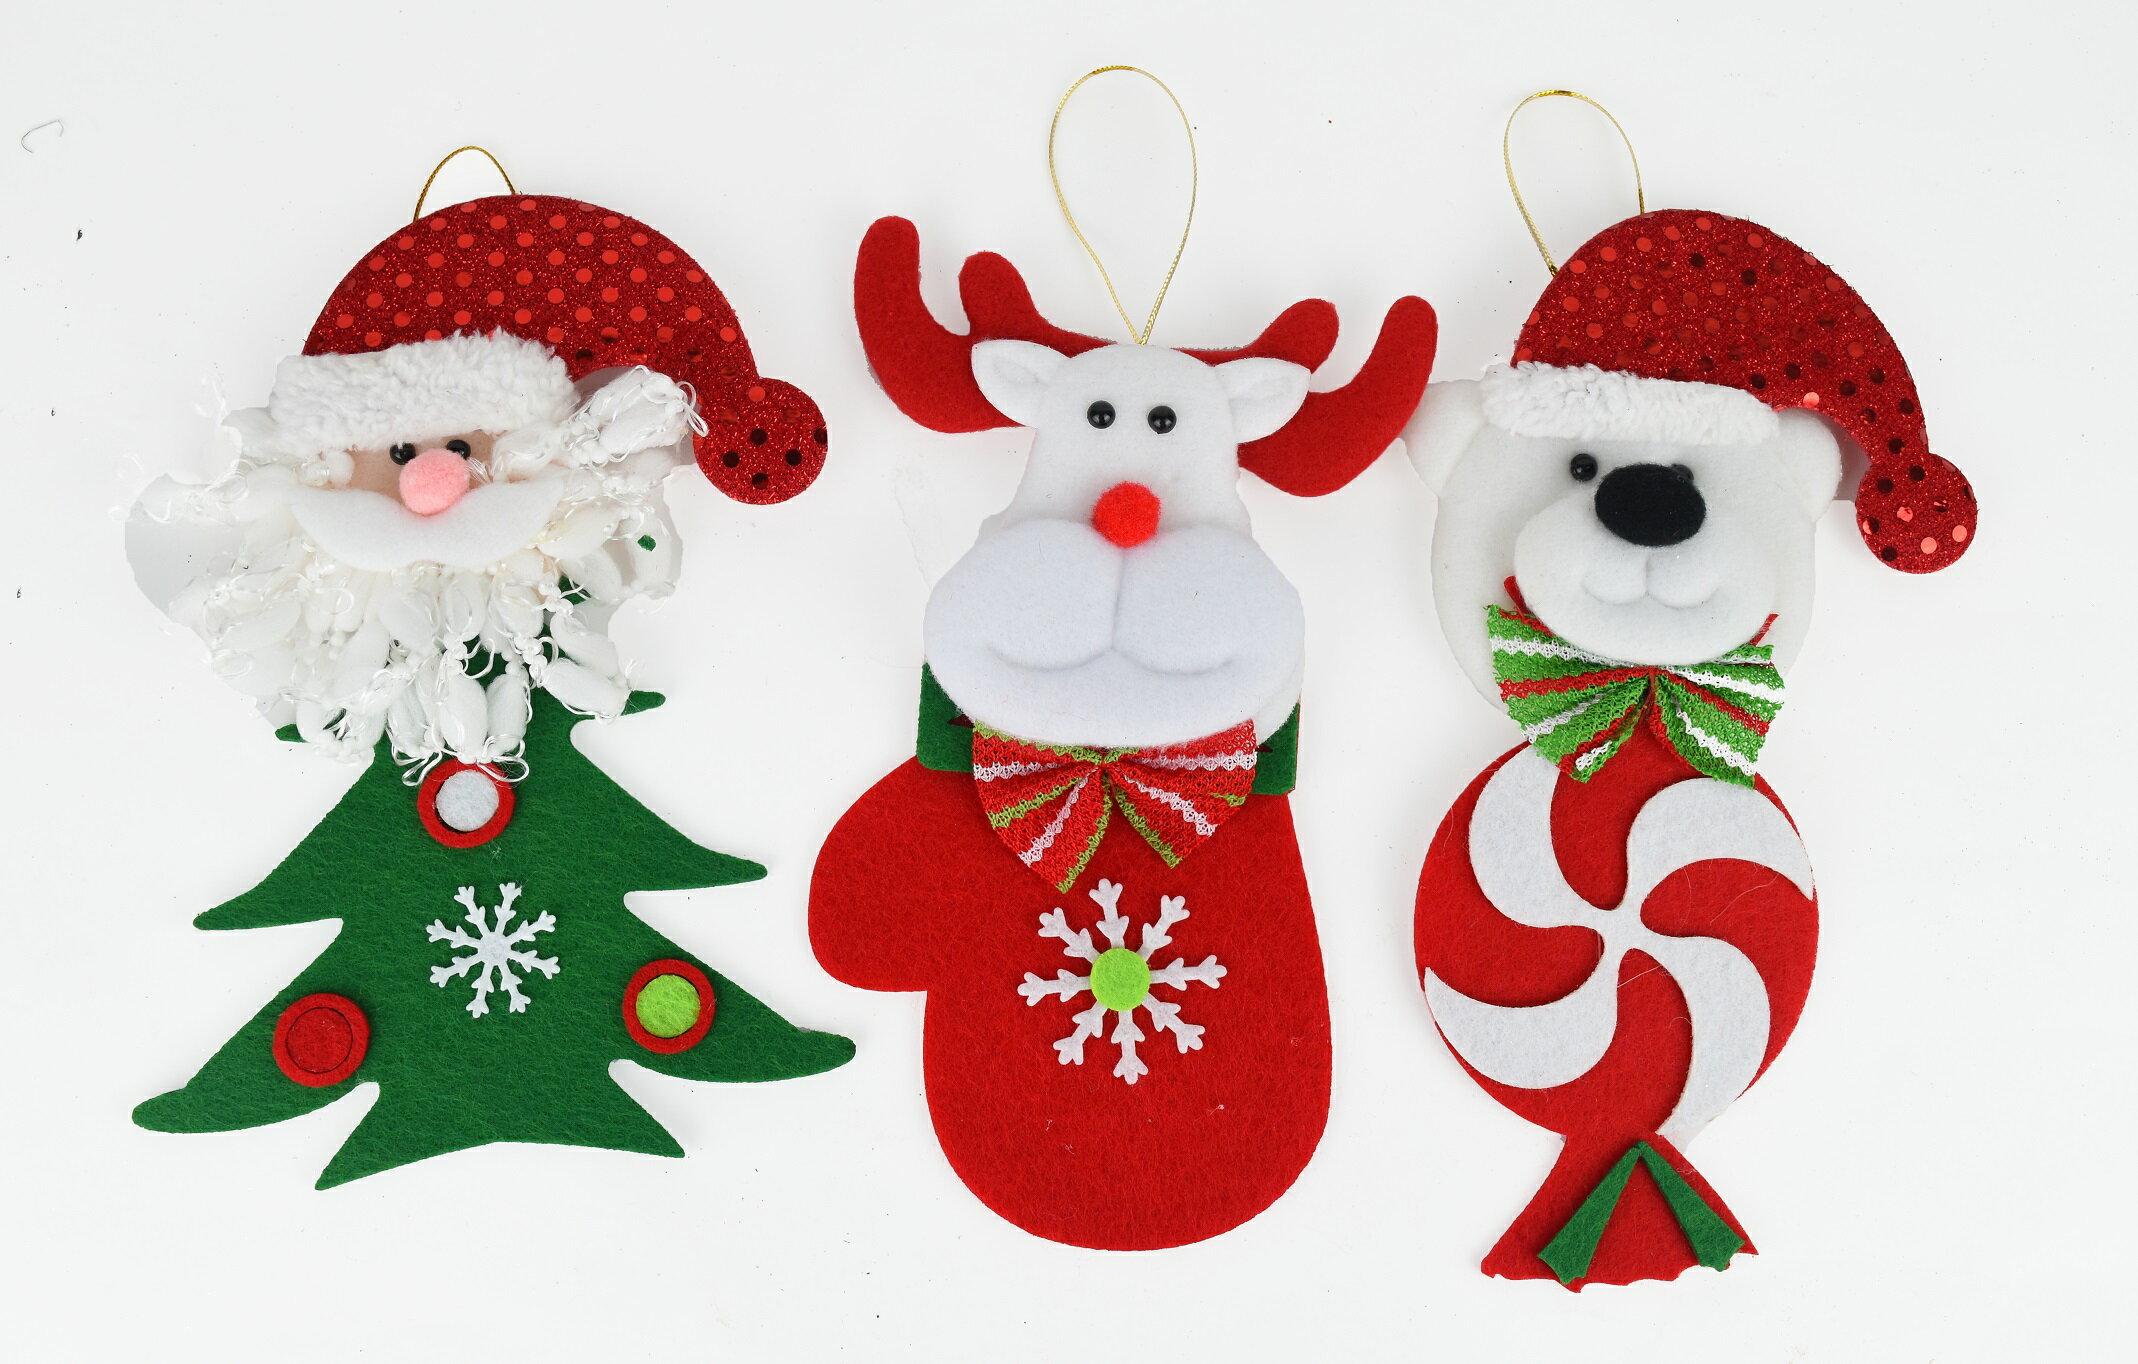 X射線【X457128】公仔聖誕造型吊飾(隨機出貨),聖誕節/交換禮物/掛飾/裝飾/吊飾/聖誕襪/禮物袋/糖果袋